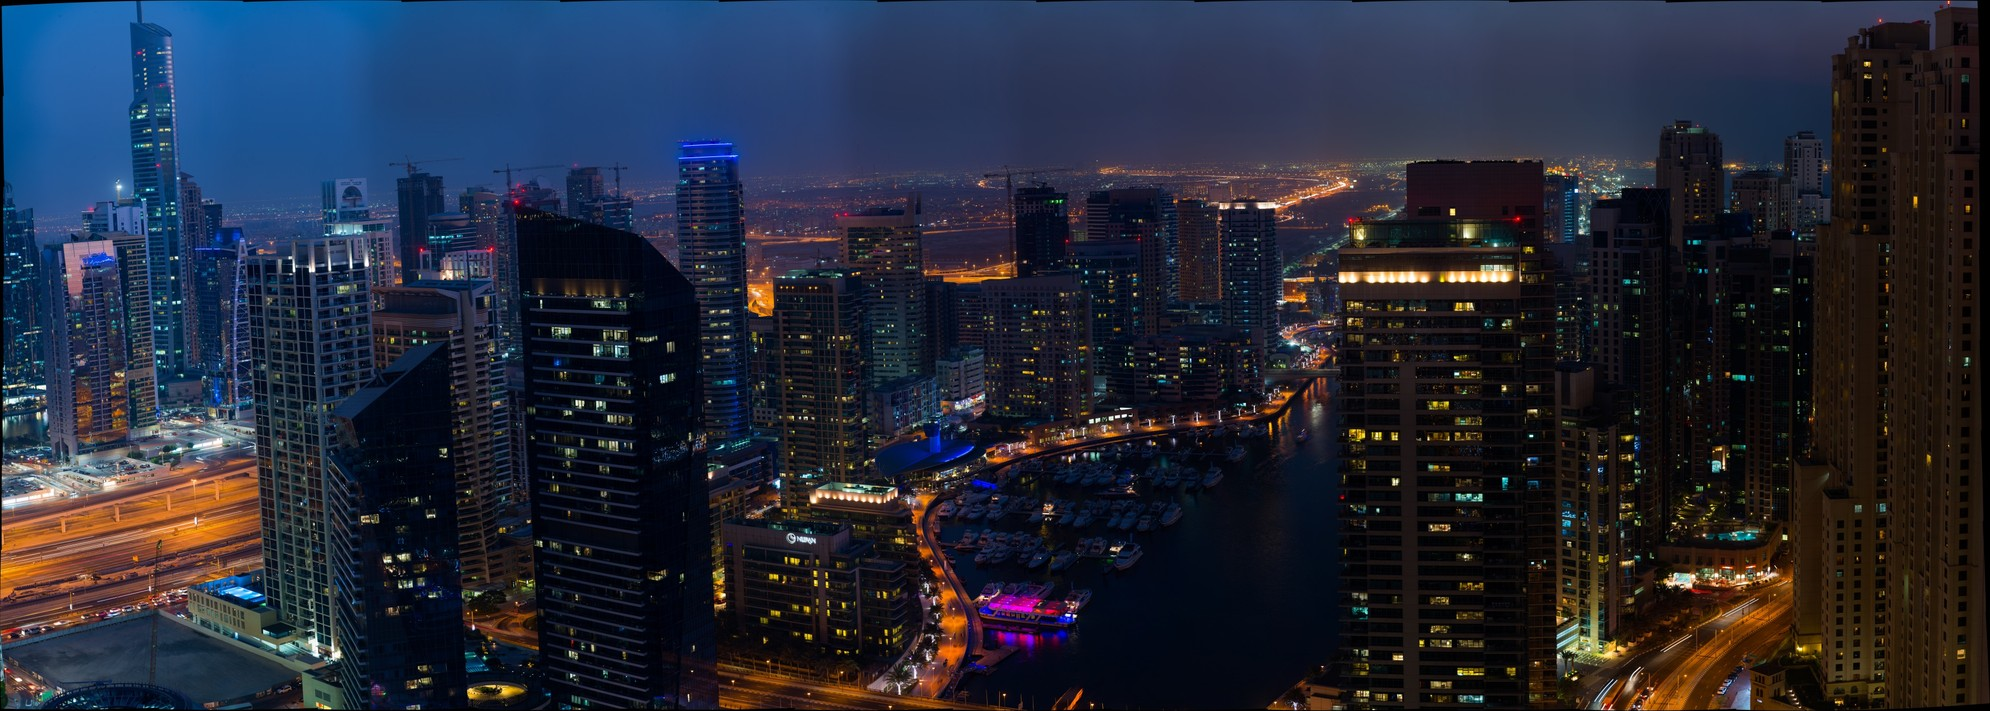 Dubai Marina Gigapixel